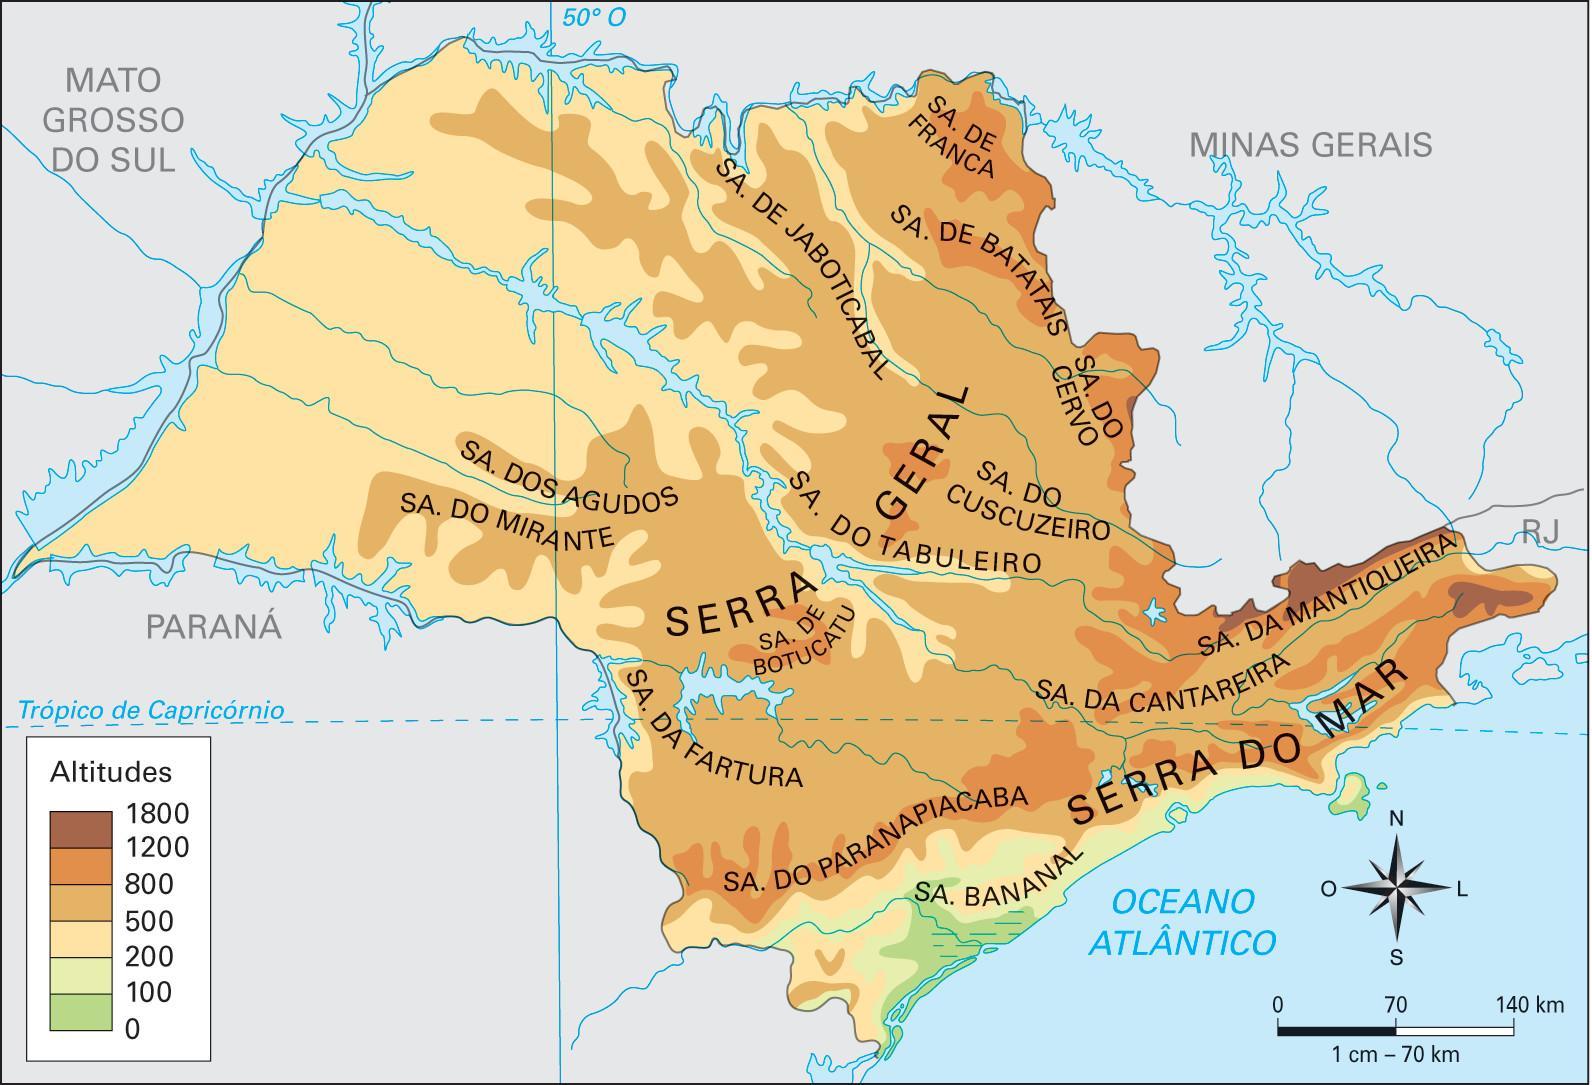 geografisk kart Geografisk São Paulo kart   Kart over geografiske São Paulo (Brasil) geografisk kart